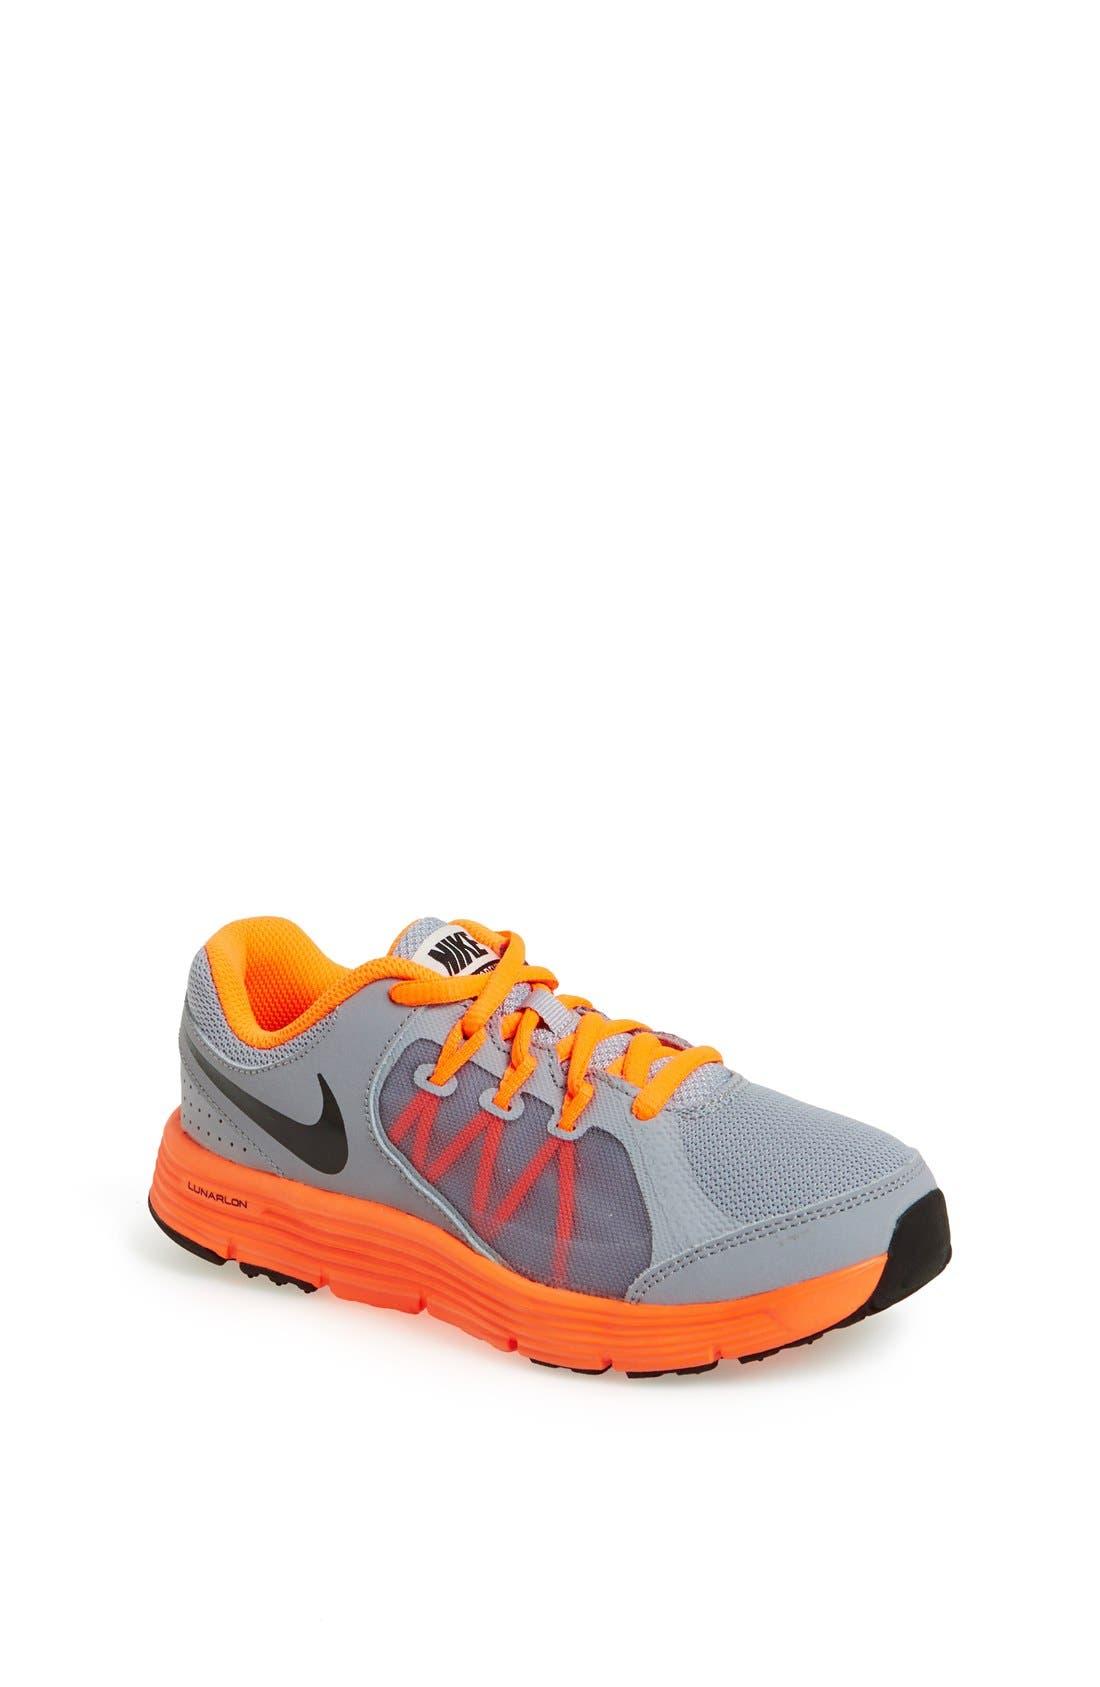 Alternate Image 1 Selected - Nike 'Lunar Forever 3' Running Shoe (Toddler & Little Kid)